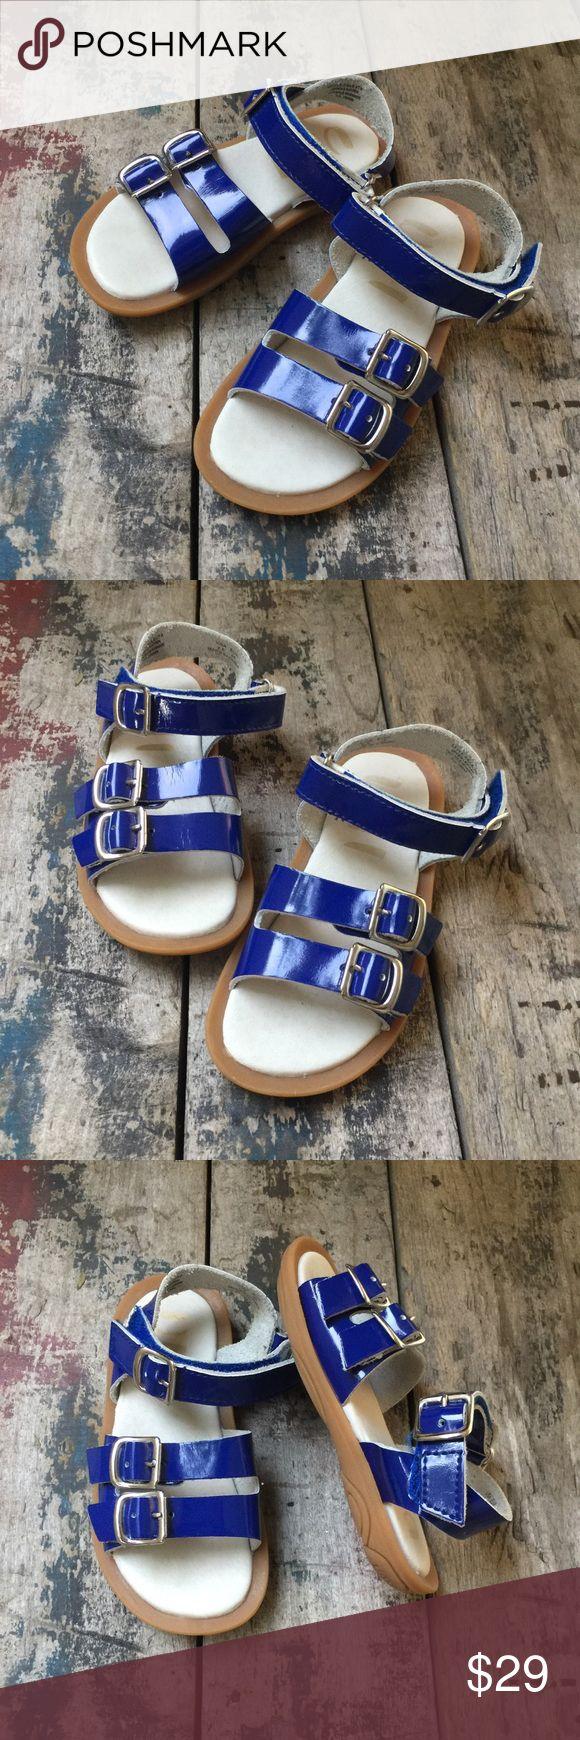 UMI SANDALS KIDS SANDALS Excellent condition clean lightly used umi Shoes Sandals & Flip Flops